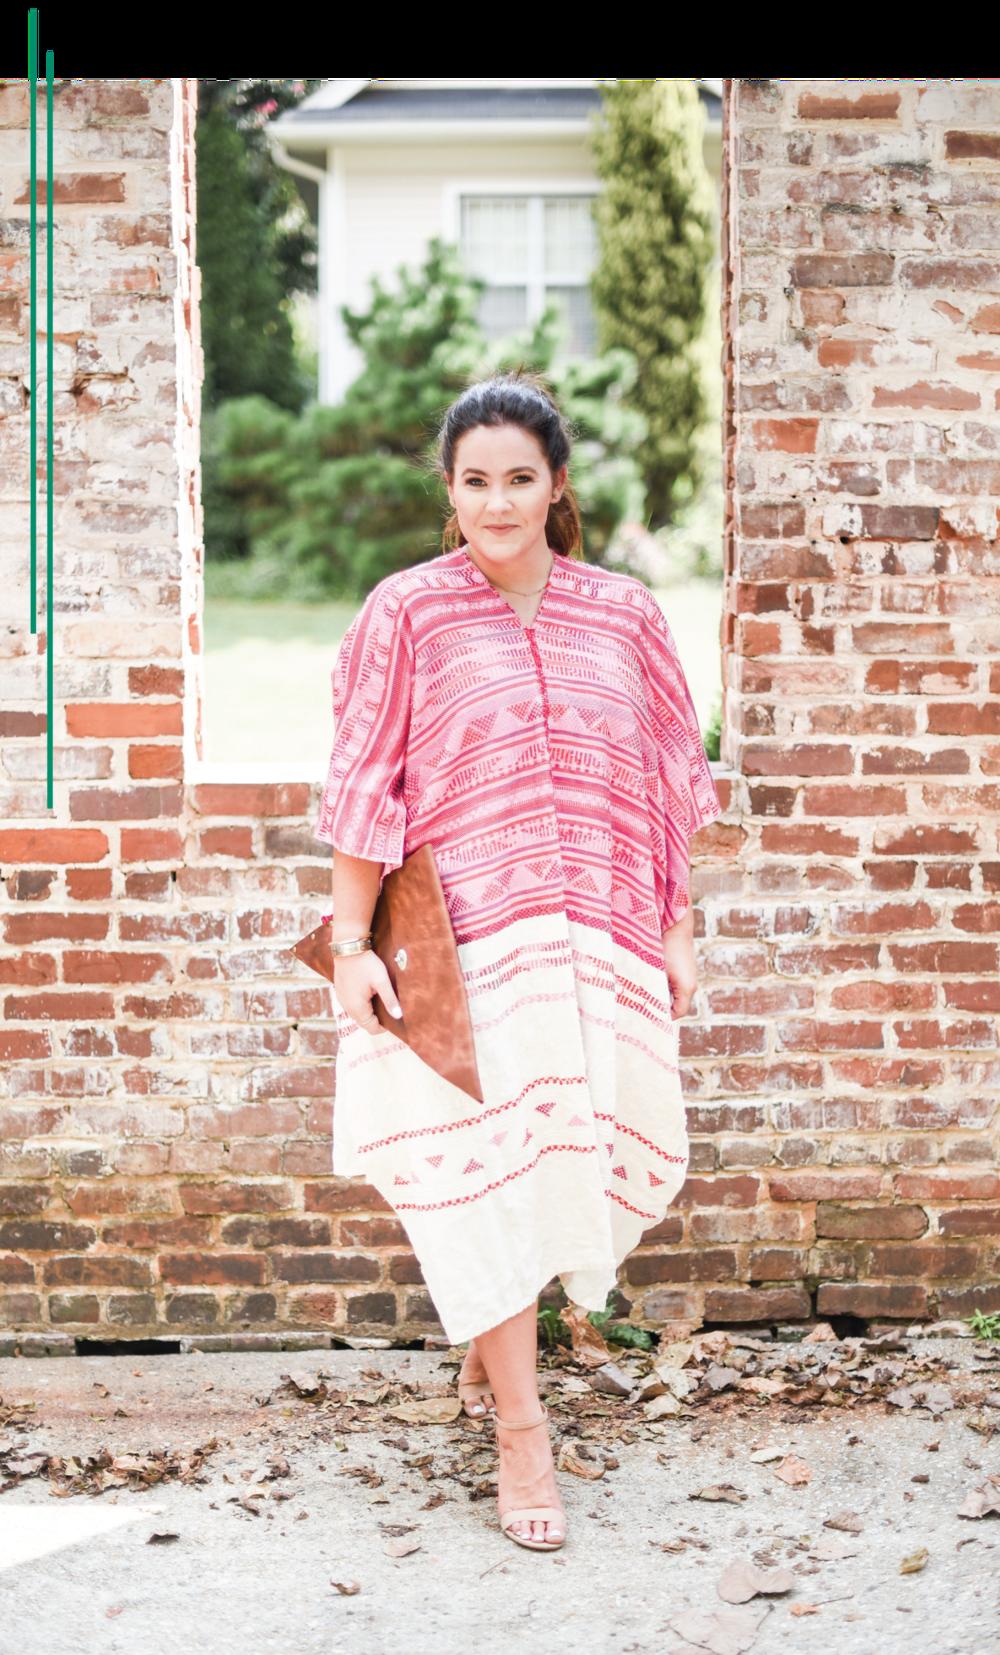 Hazlo Handmade Guatemala Fair Trade Hand Woven Leather Bags Accessories Belts Antigua Slow Fashion Purse Shleby Ausband Apoyo4.png